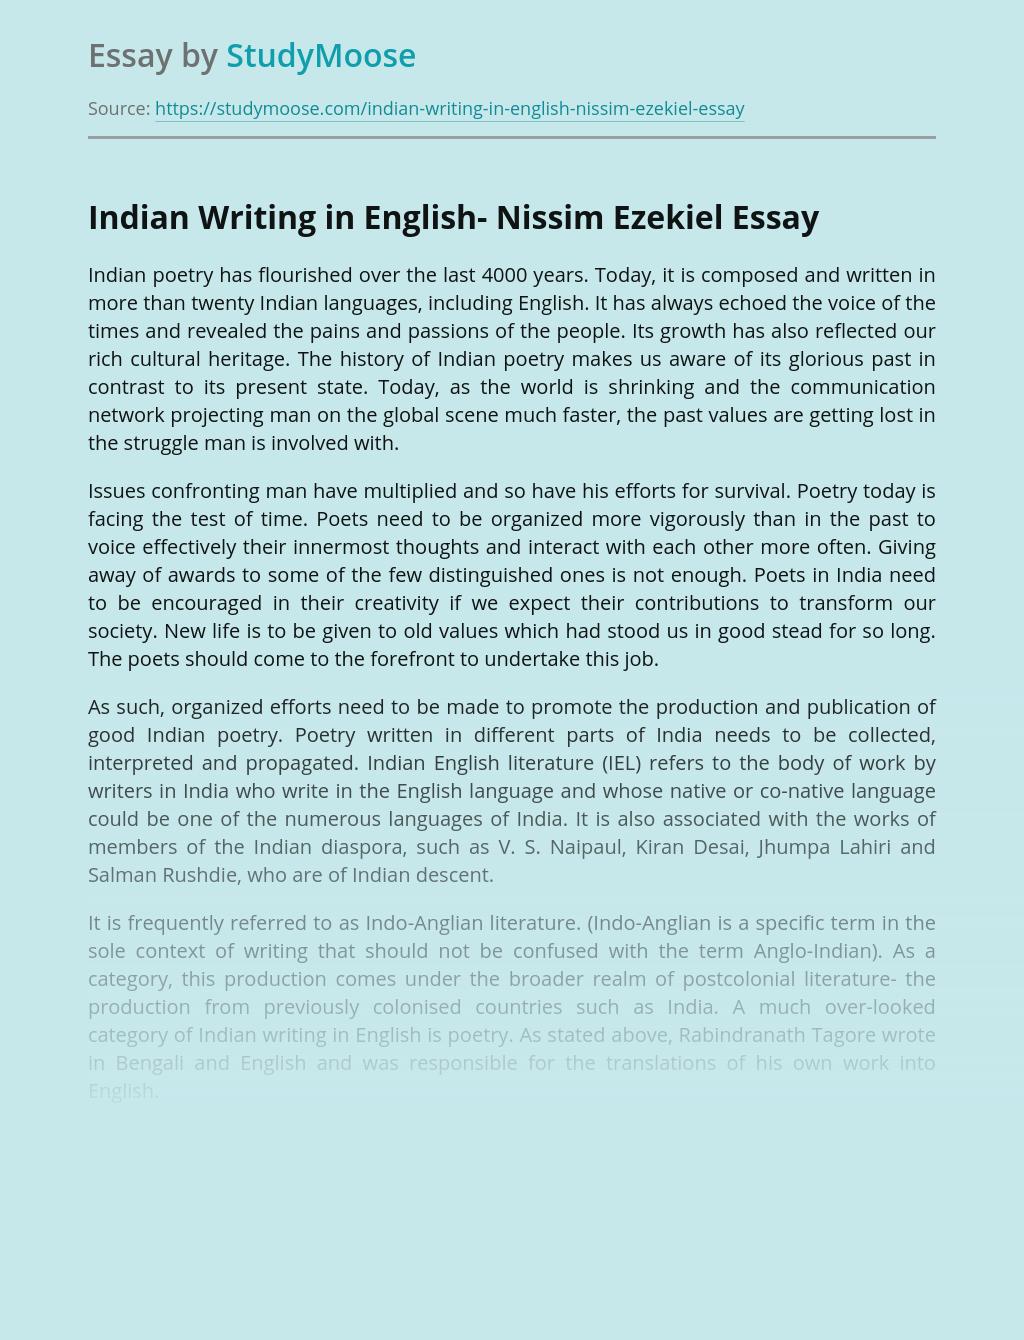 Indian Writing in English- Nissim Ezekiel